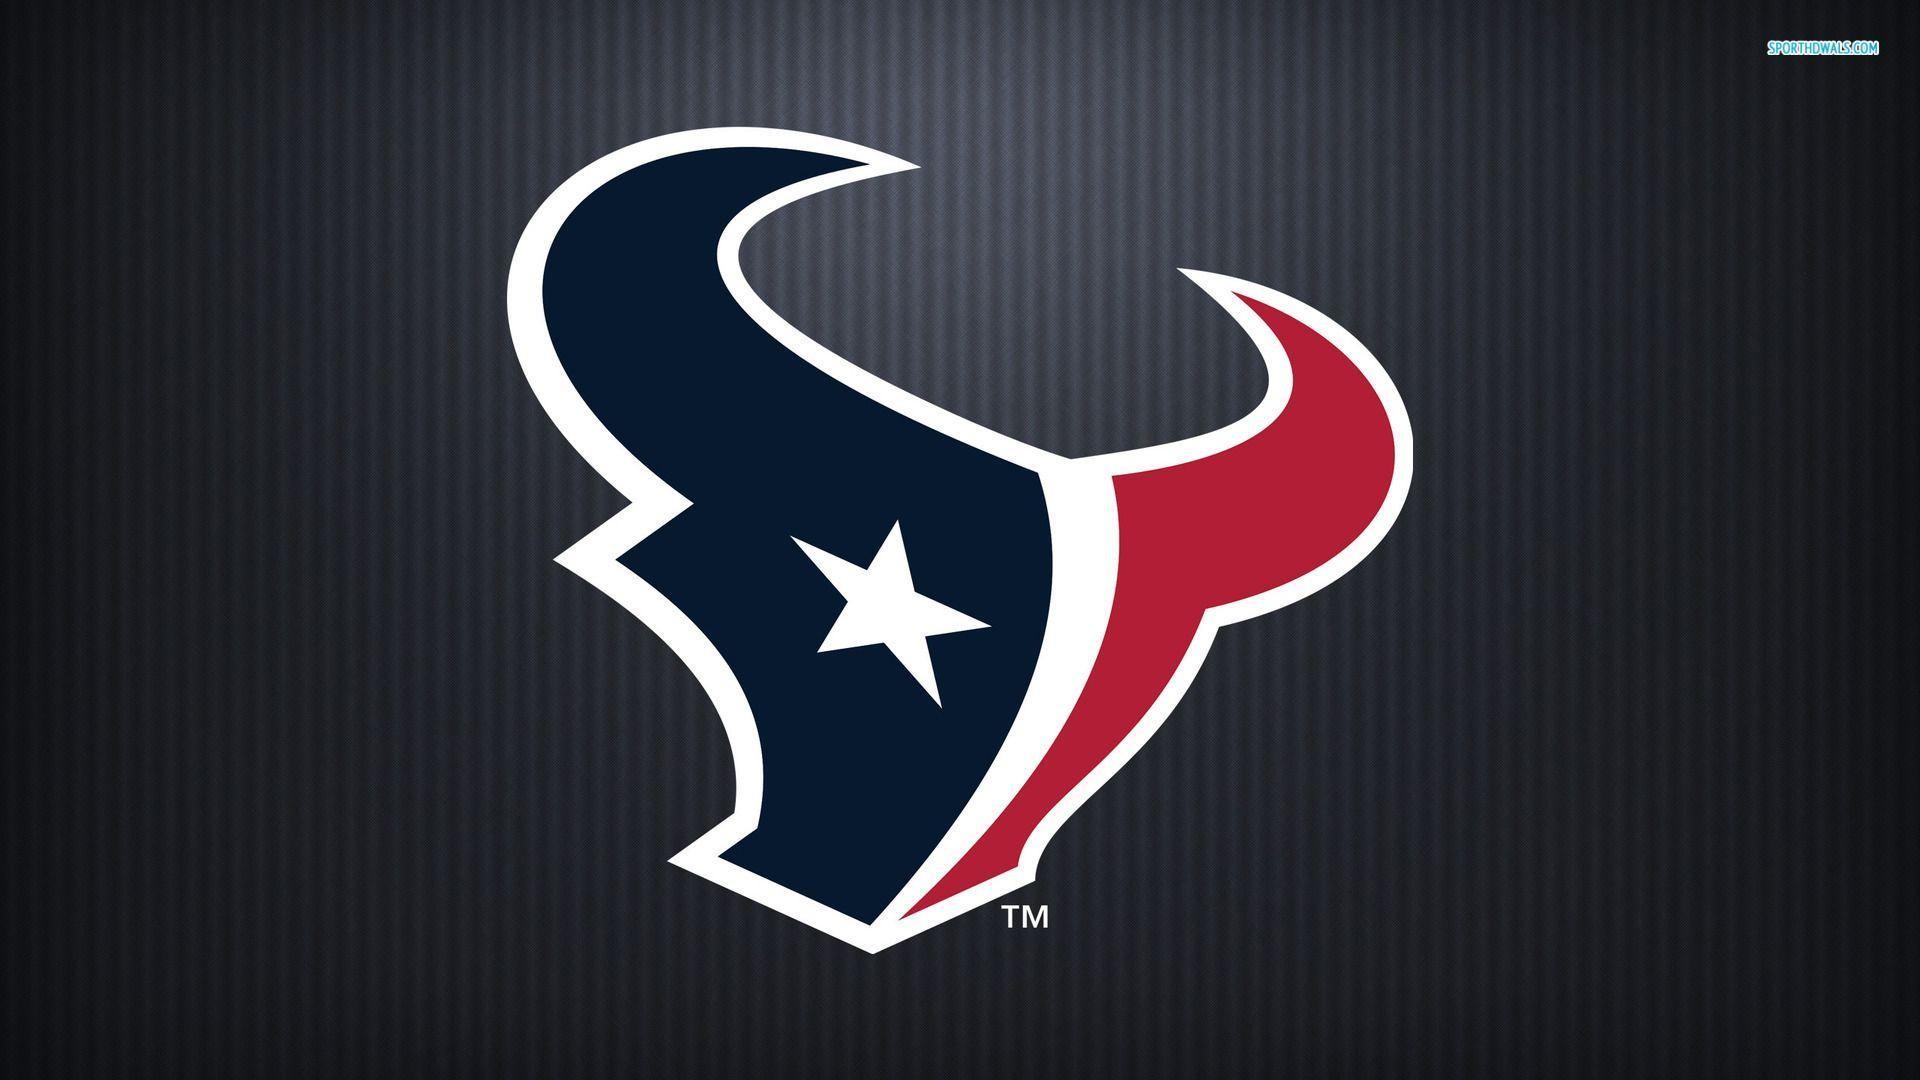 Houston Texans Wallpaper HD (69+ images)